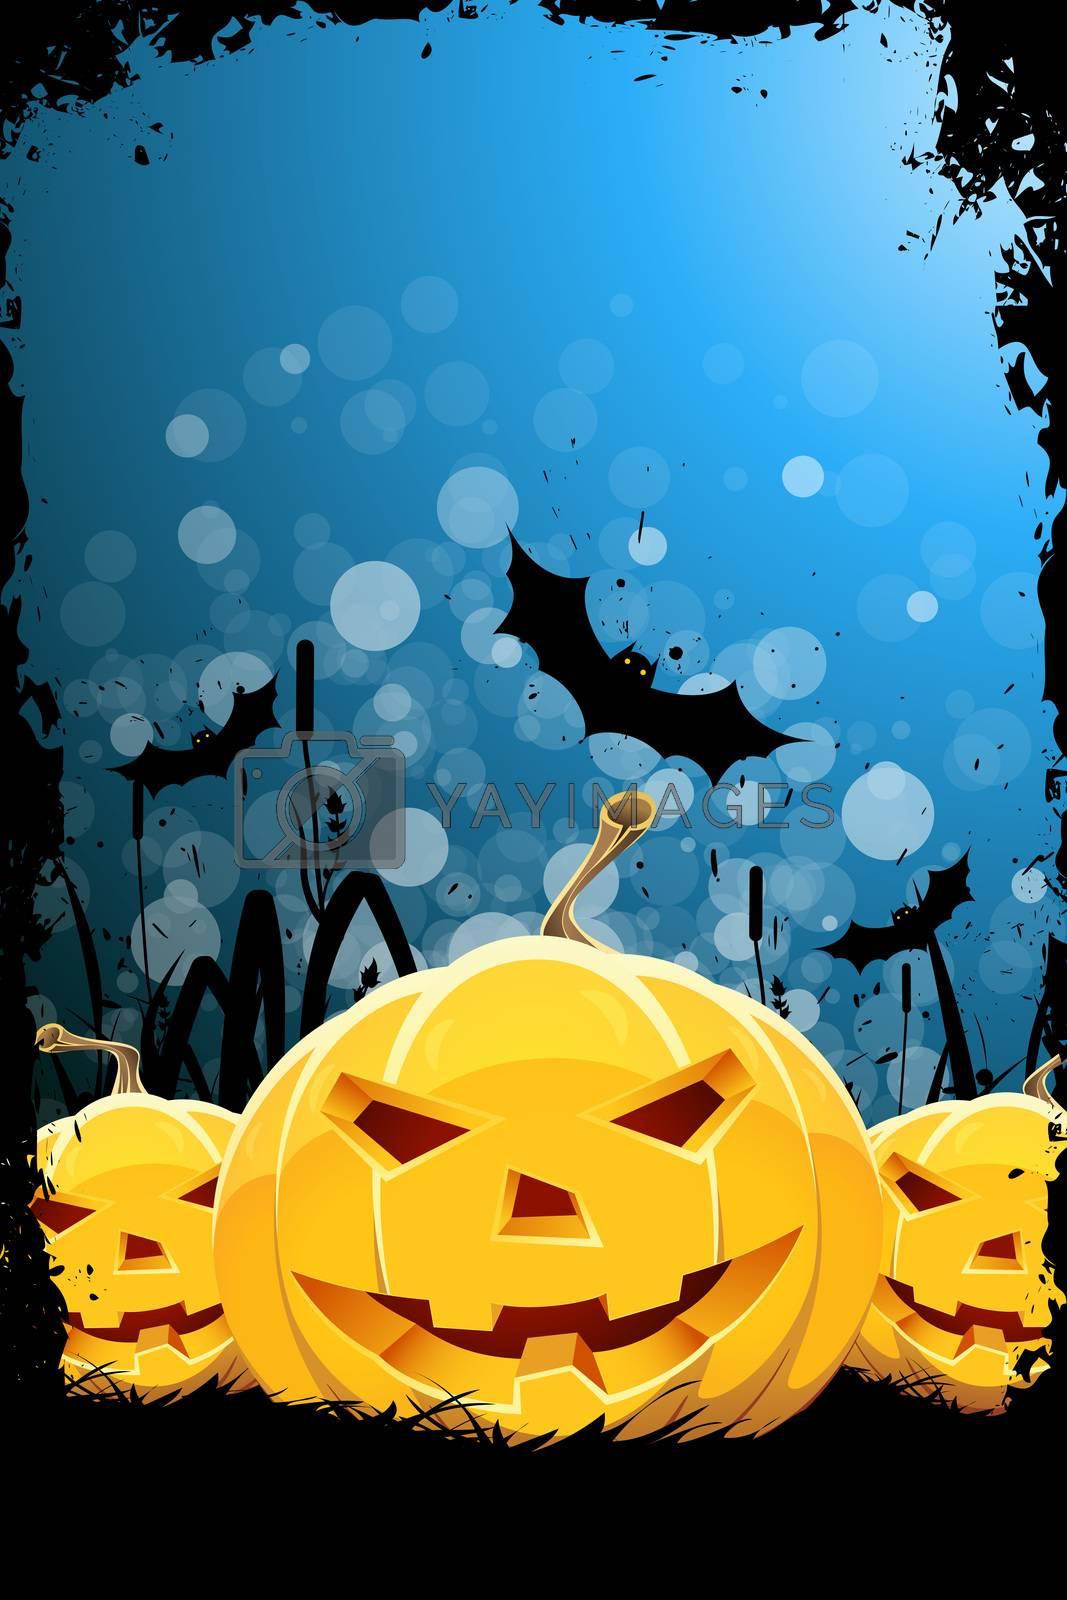 Grungy Halloween Background with Pumpkin, Bats and Grass